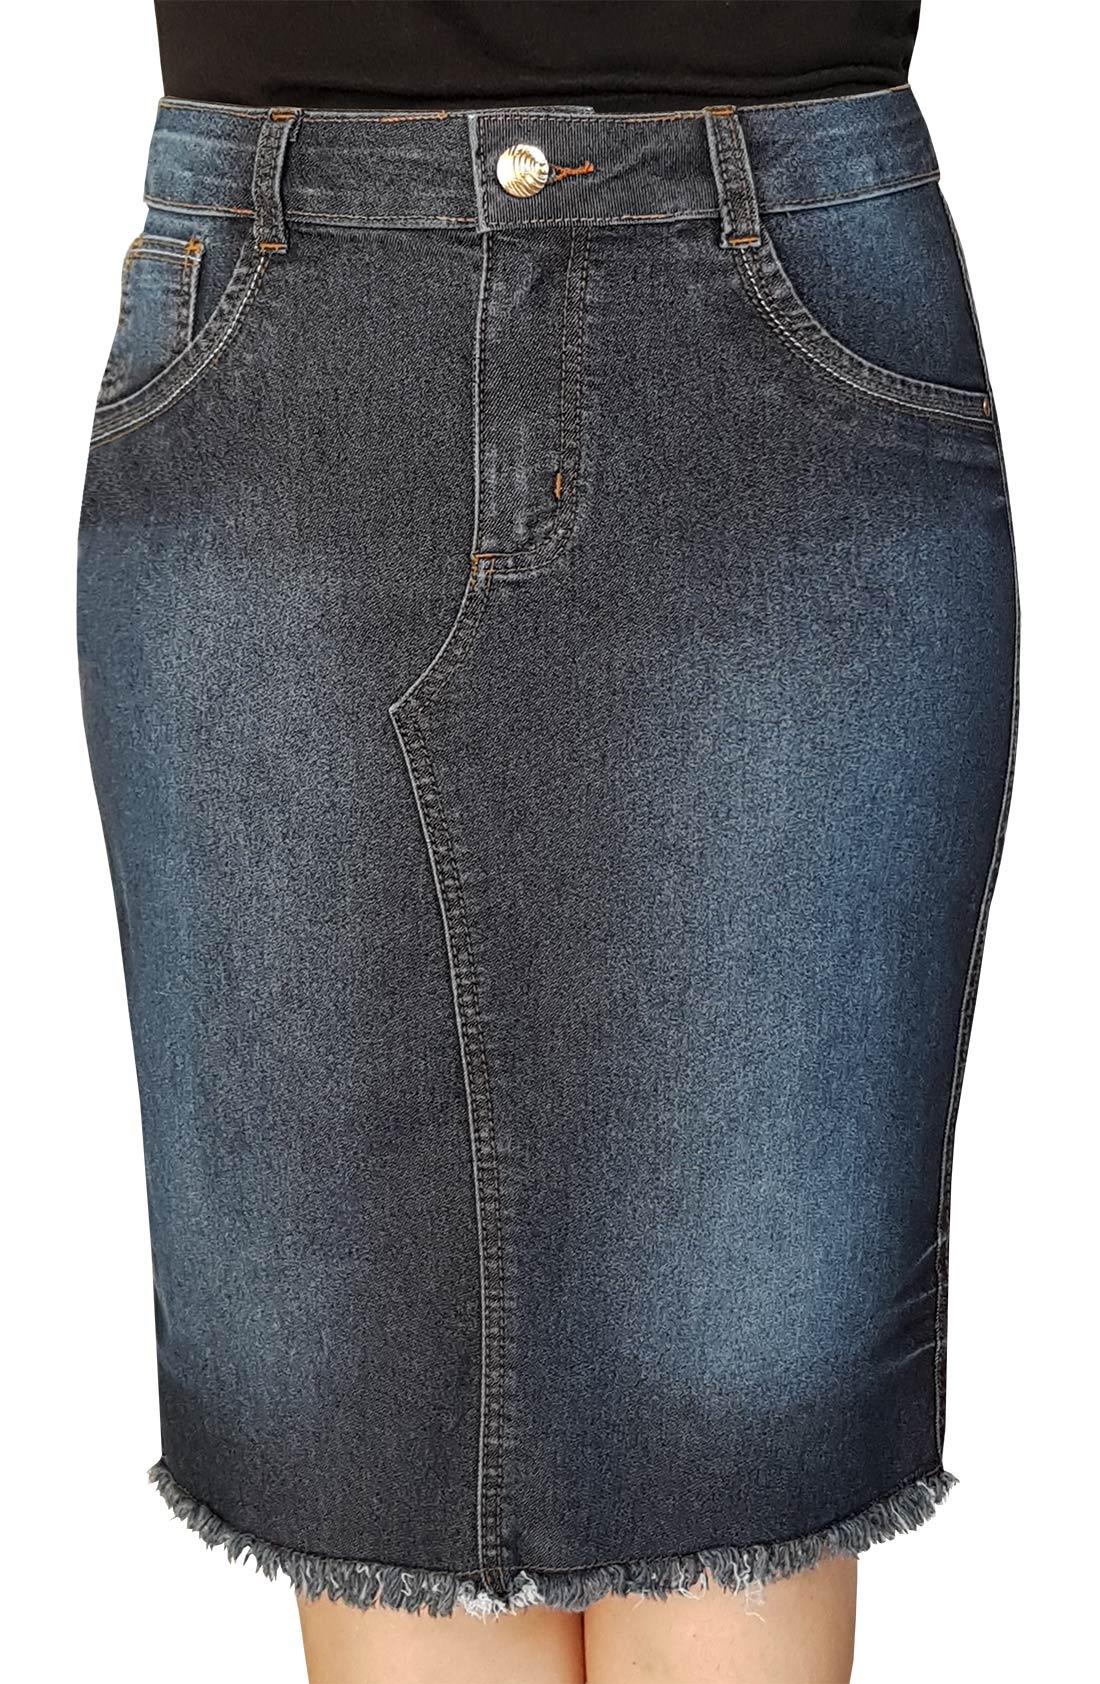 Saia Jeans Escura Midi com Barra Desfiada Dyork Jeans